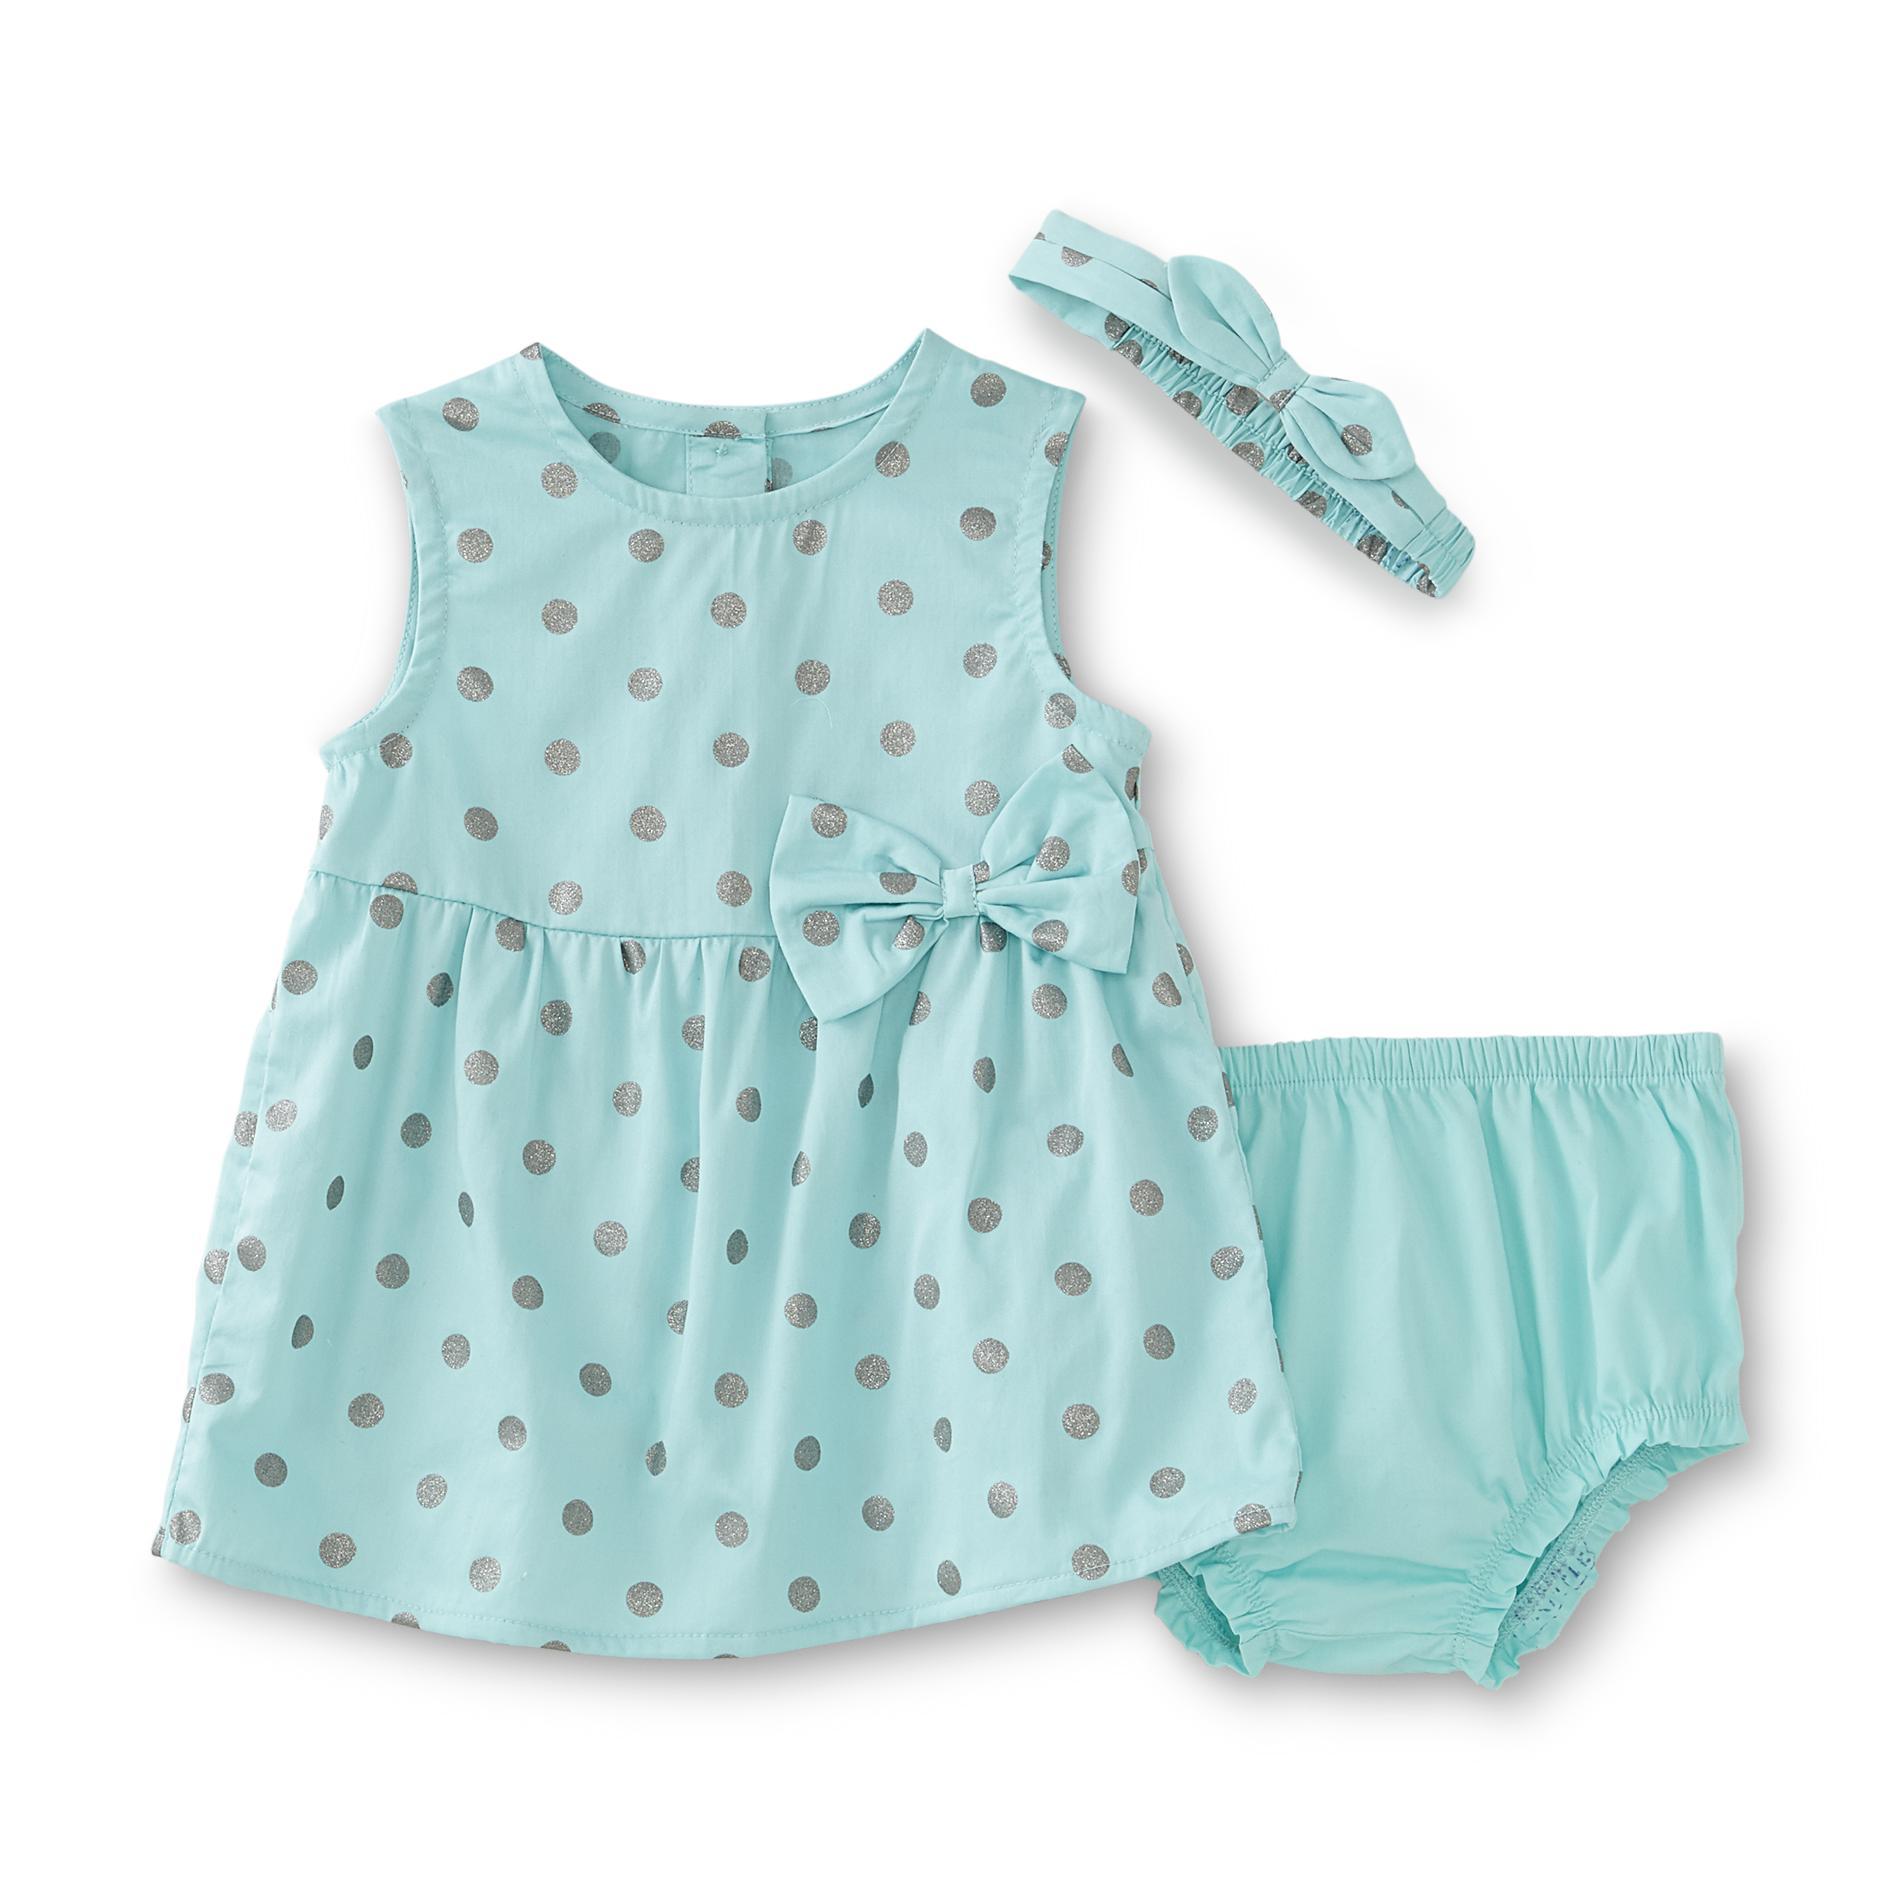 Small Wonders Newborn Girl's Sleeveless Dress, Headband & Diaper Cover